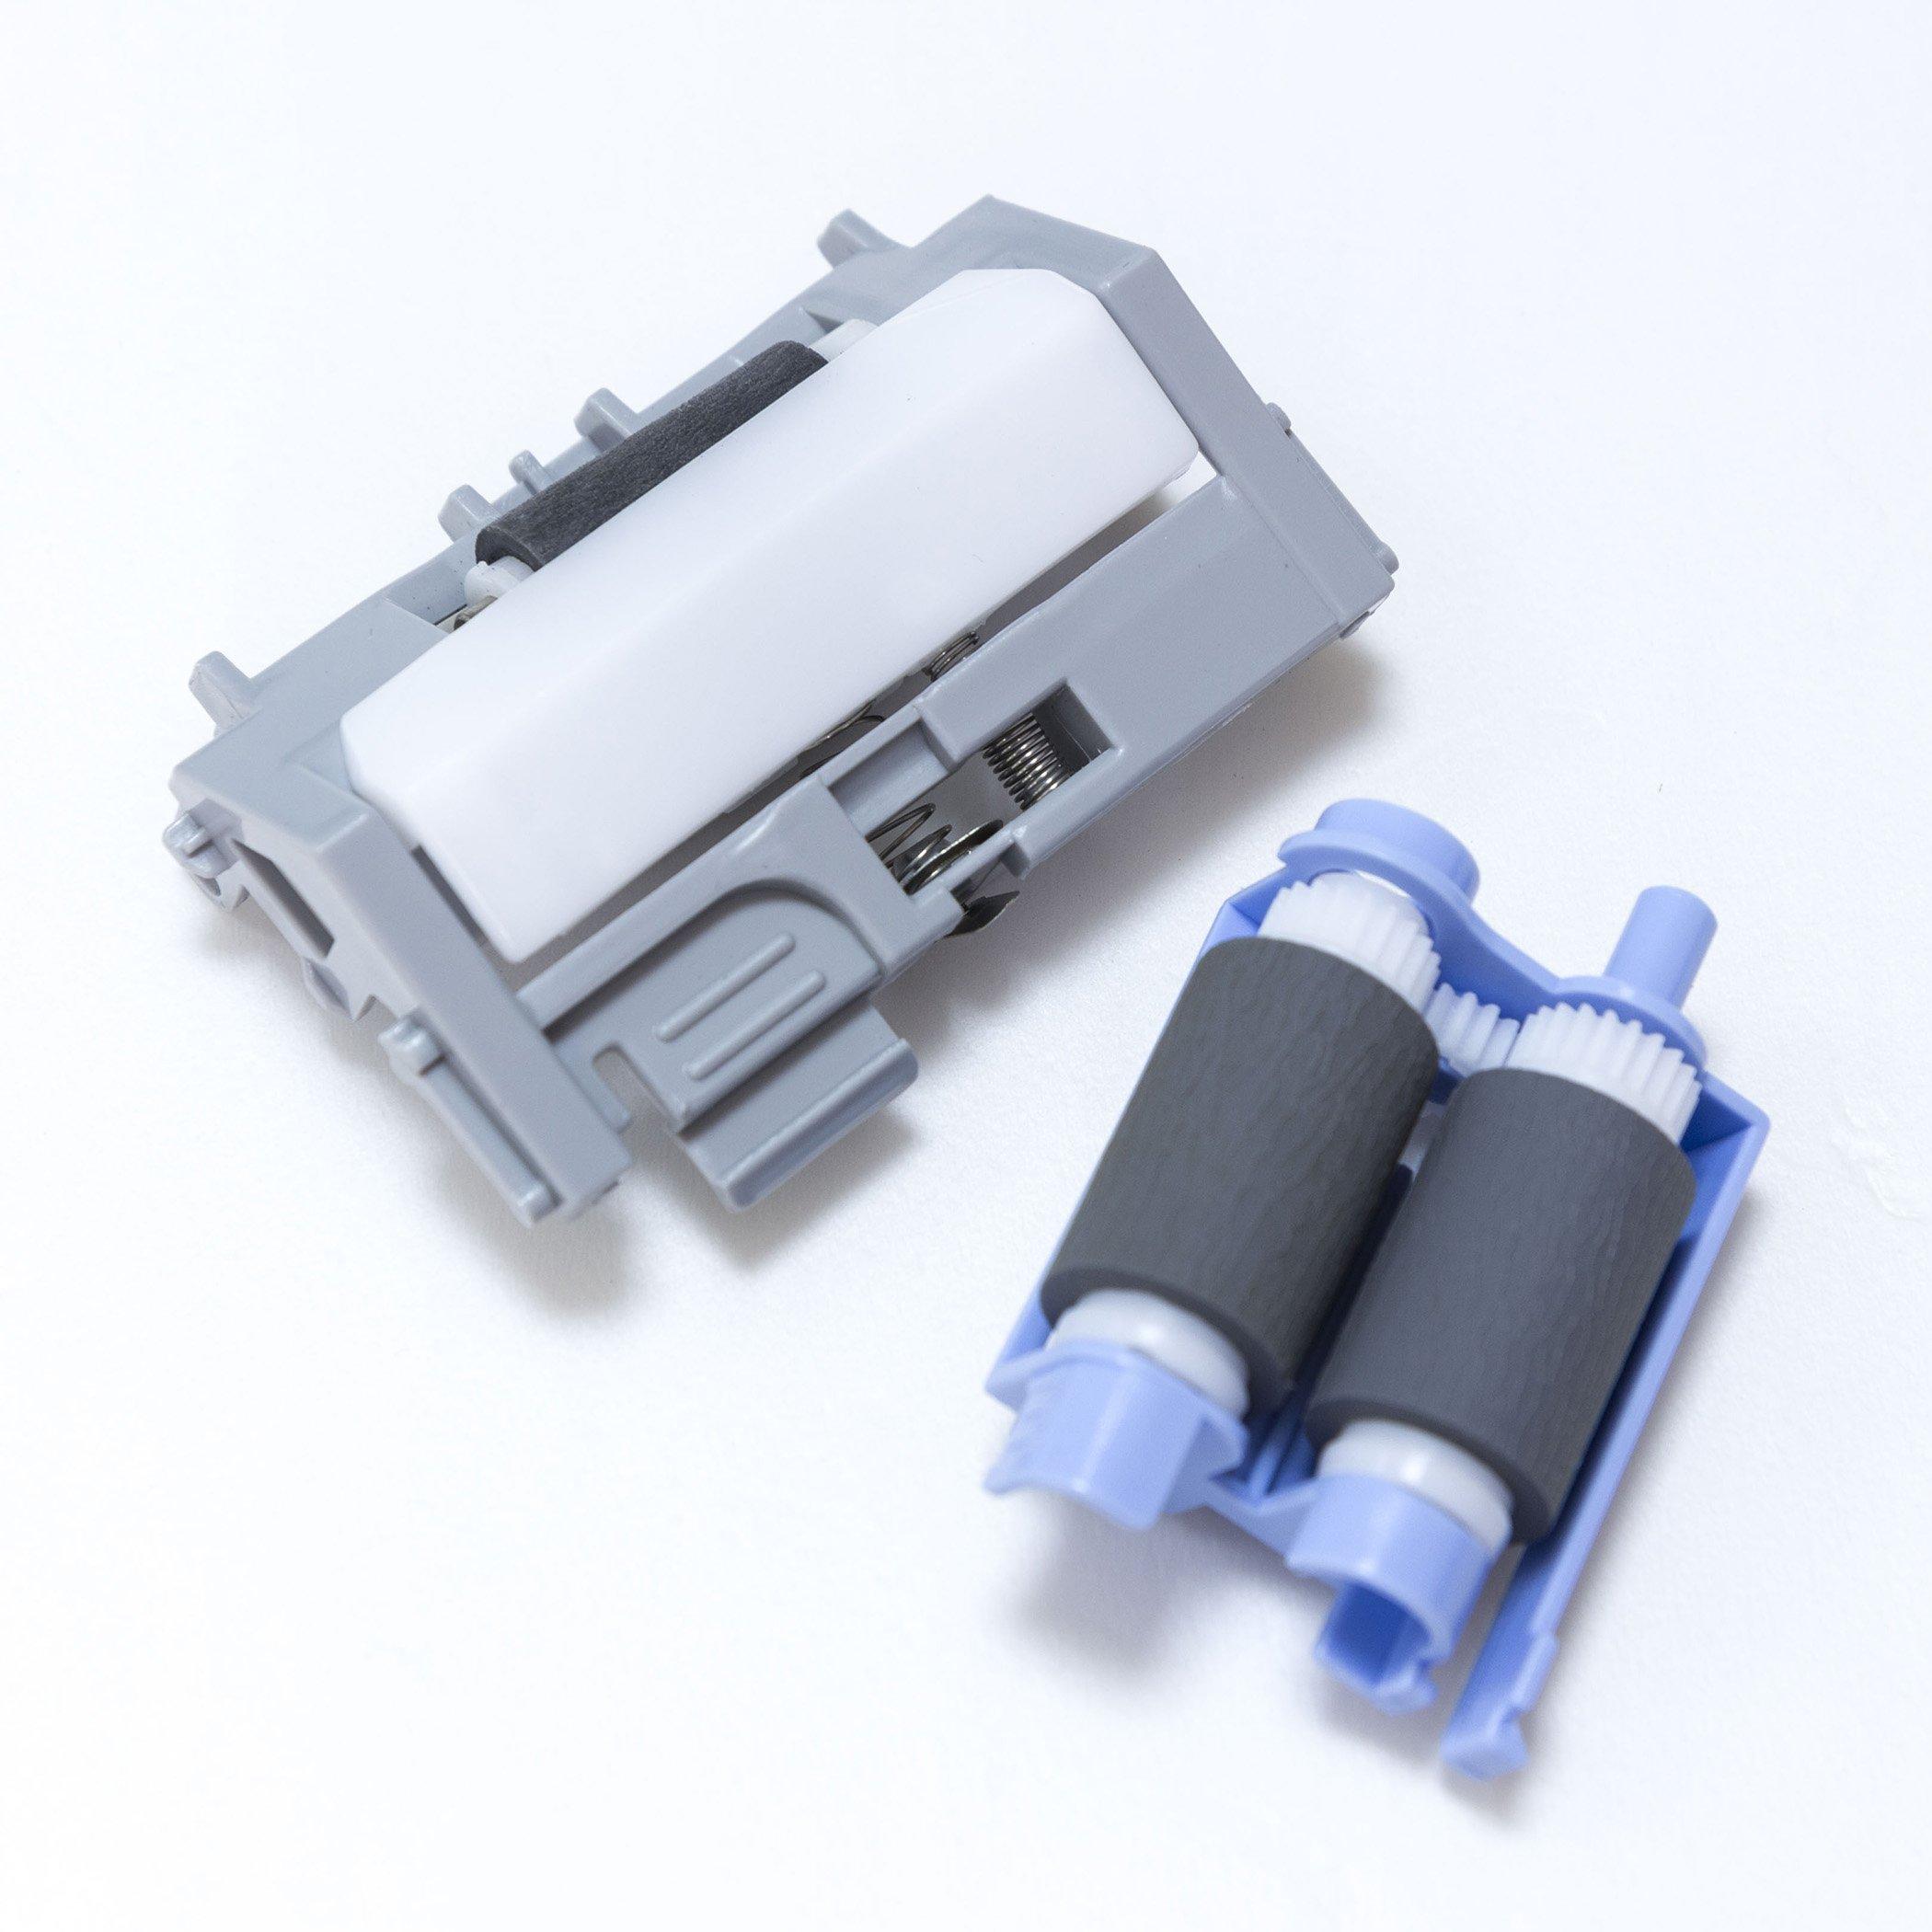 YANZEO RM2-5452 RM2-5397 Laserjet Pro M402 M403 M426 M427 T2 Pick Up Roller Seperation Roller